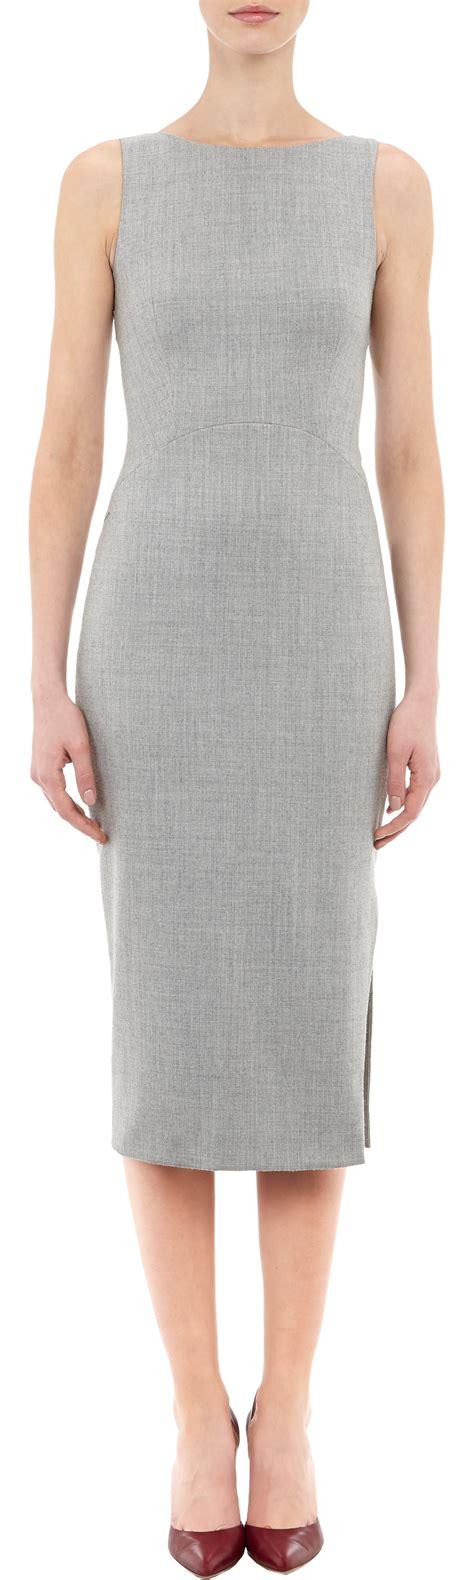 Gray Sleeveless Two Dress altuzarra sleeveless shadow sheath dress in gray grey lyst